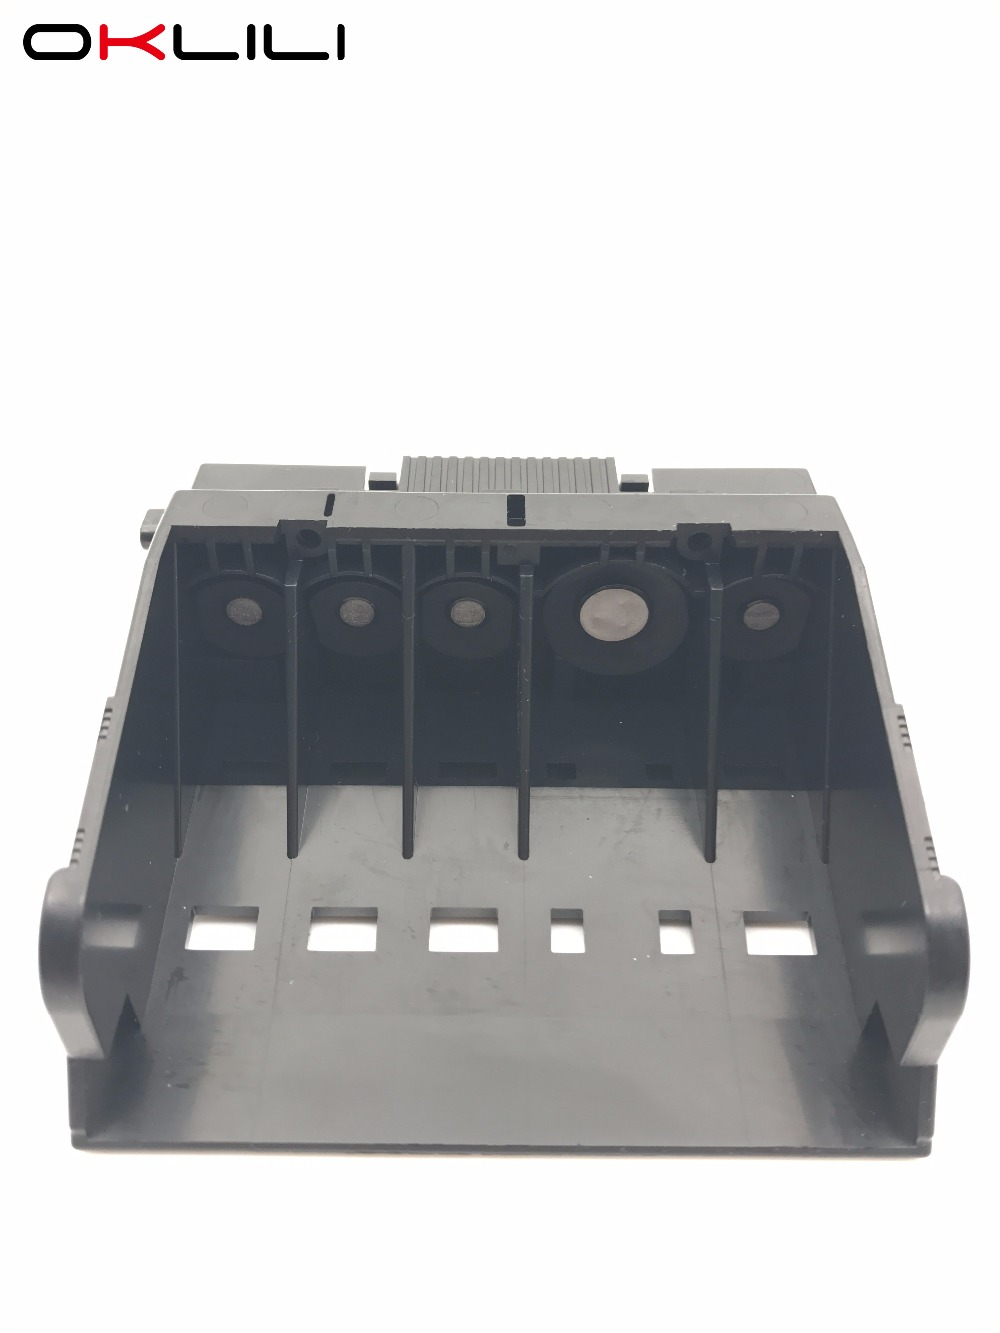 OKLILI QY6-0049 Printhead Print Head Printer Head for Canon 860i 865 i860 i865 MP770 MP790 iP4000 iP4100 MP750 MP760 MP780<br>